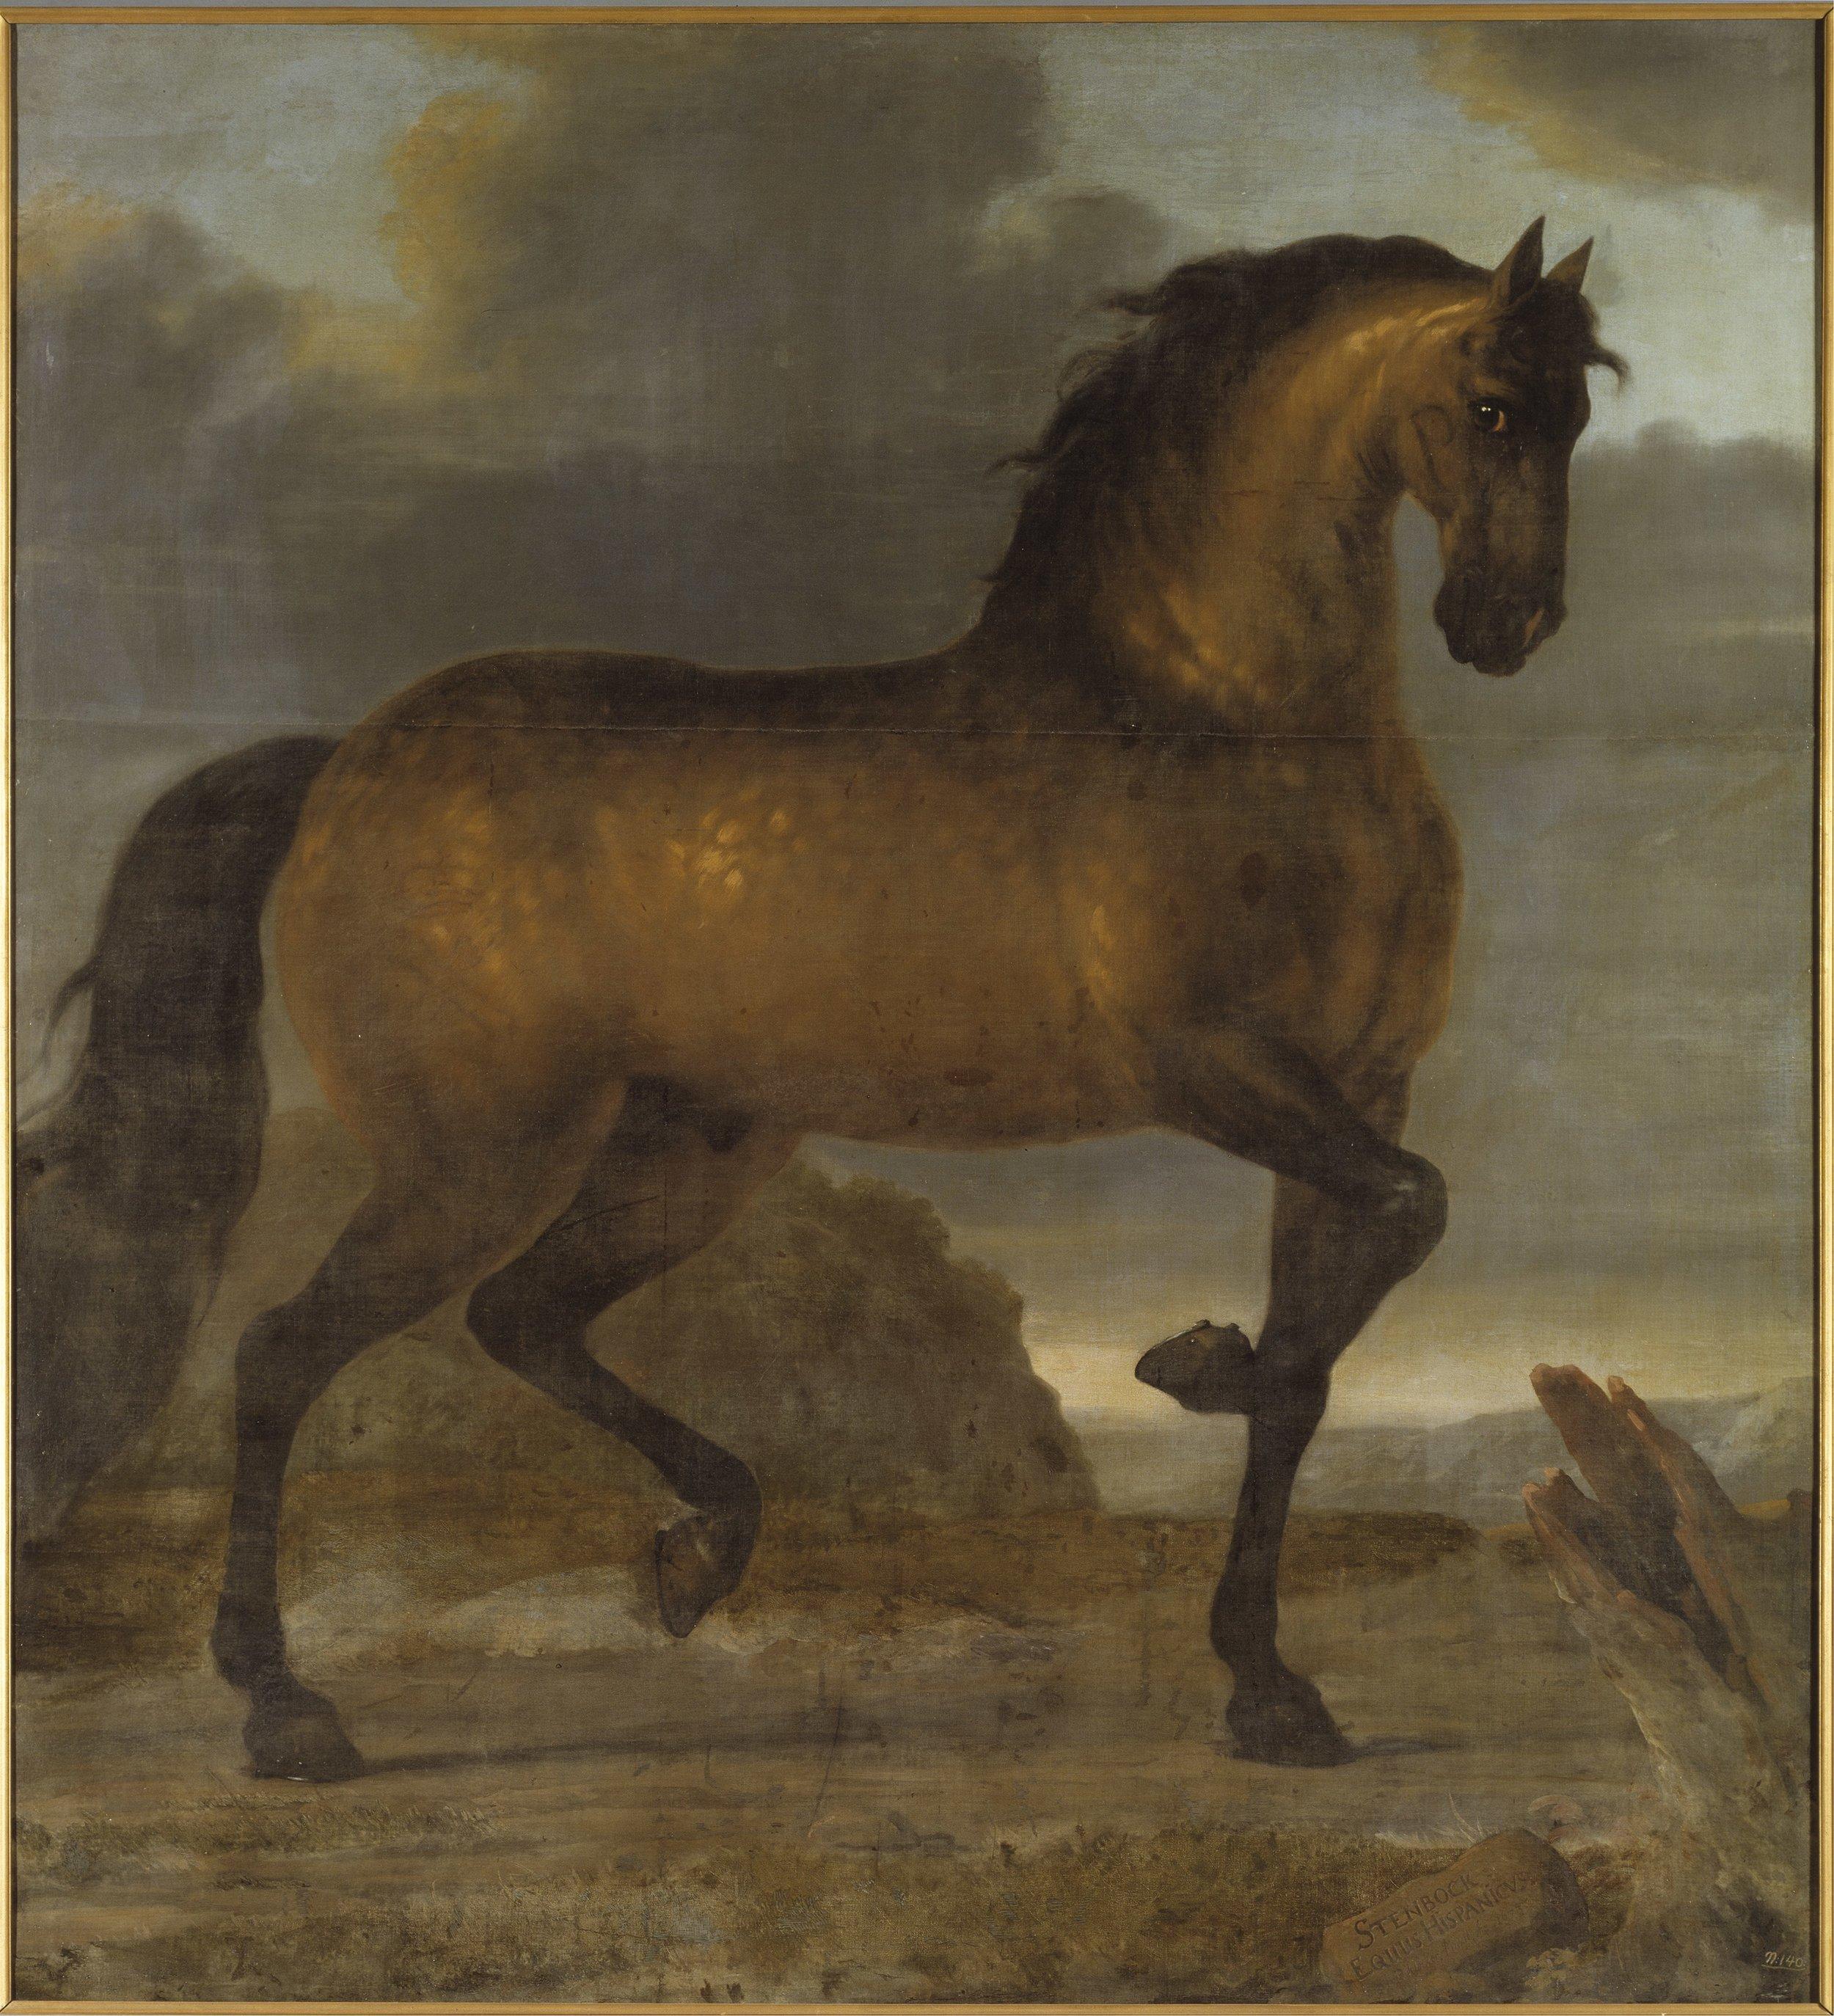 David Klöcker Ehrenstrahl,  Karl XIs livhäst Stenbock, 1673, Nationalmuseum